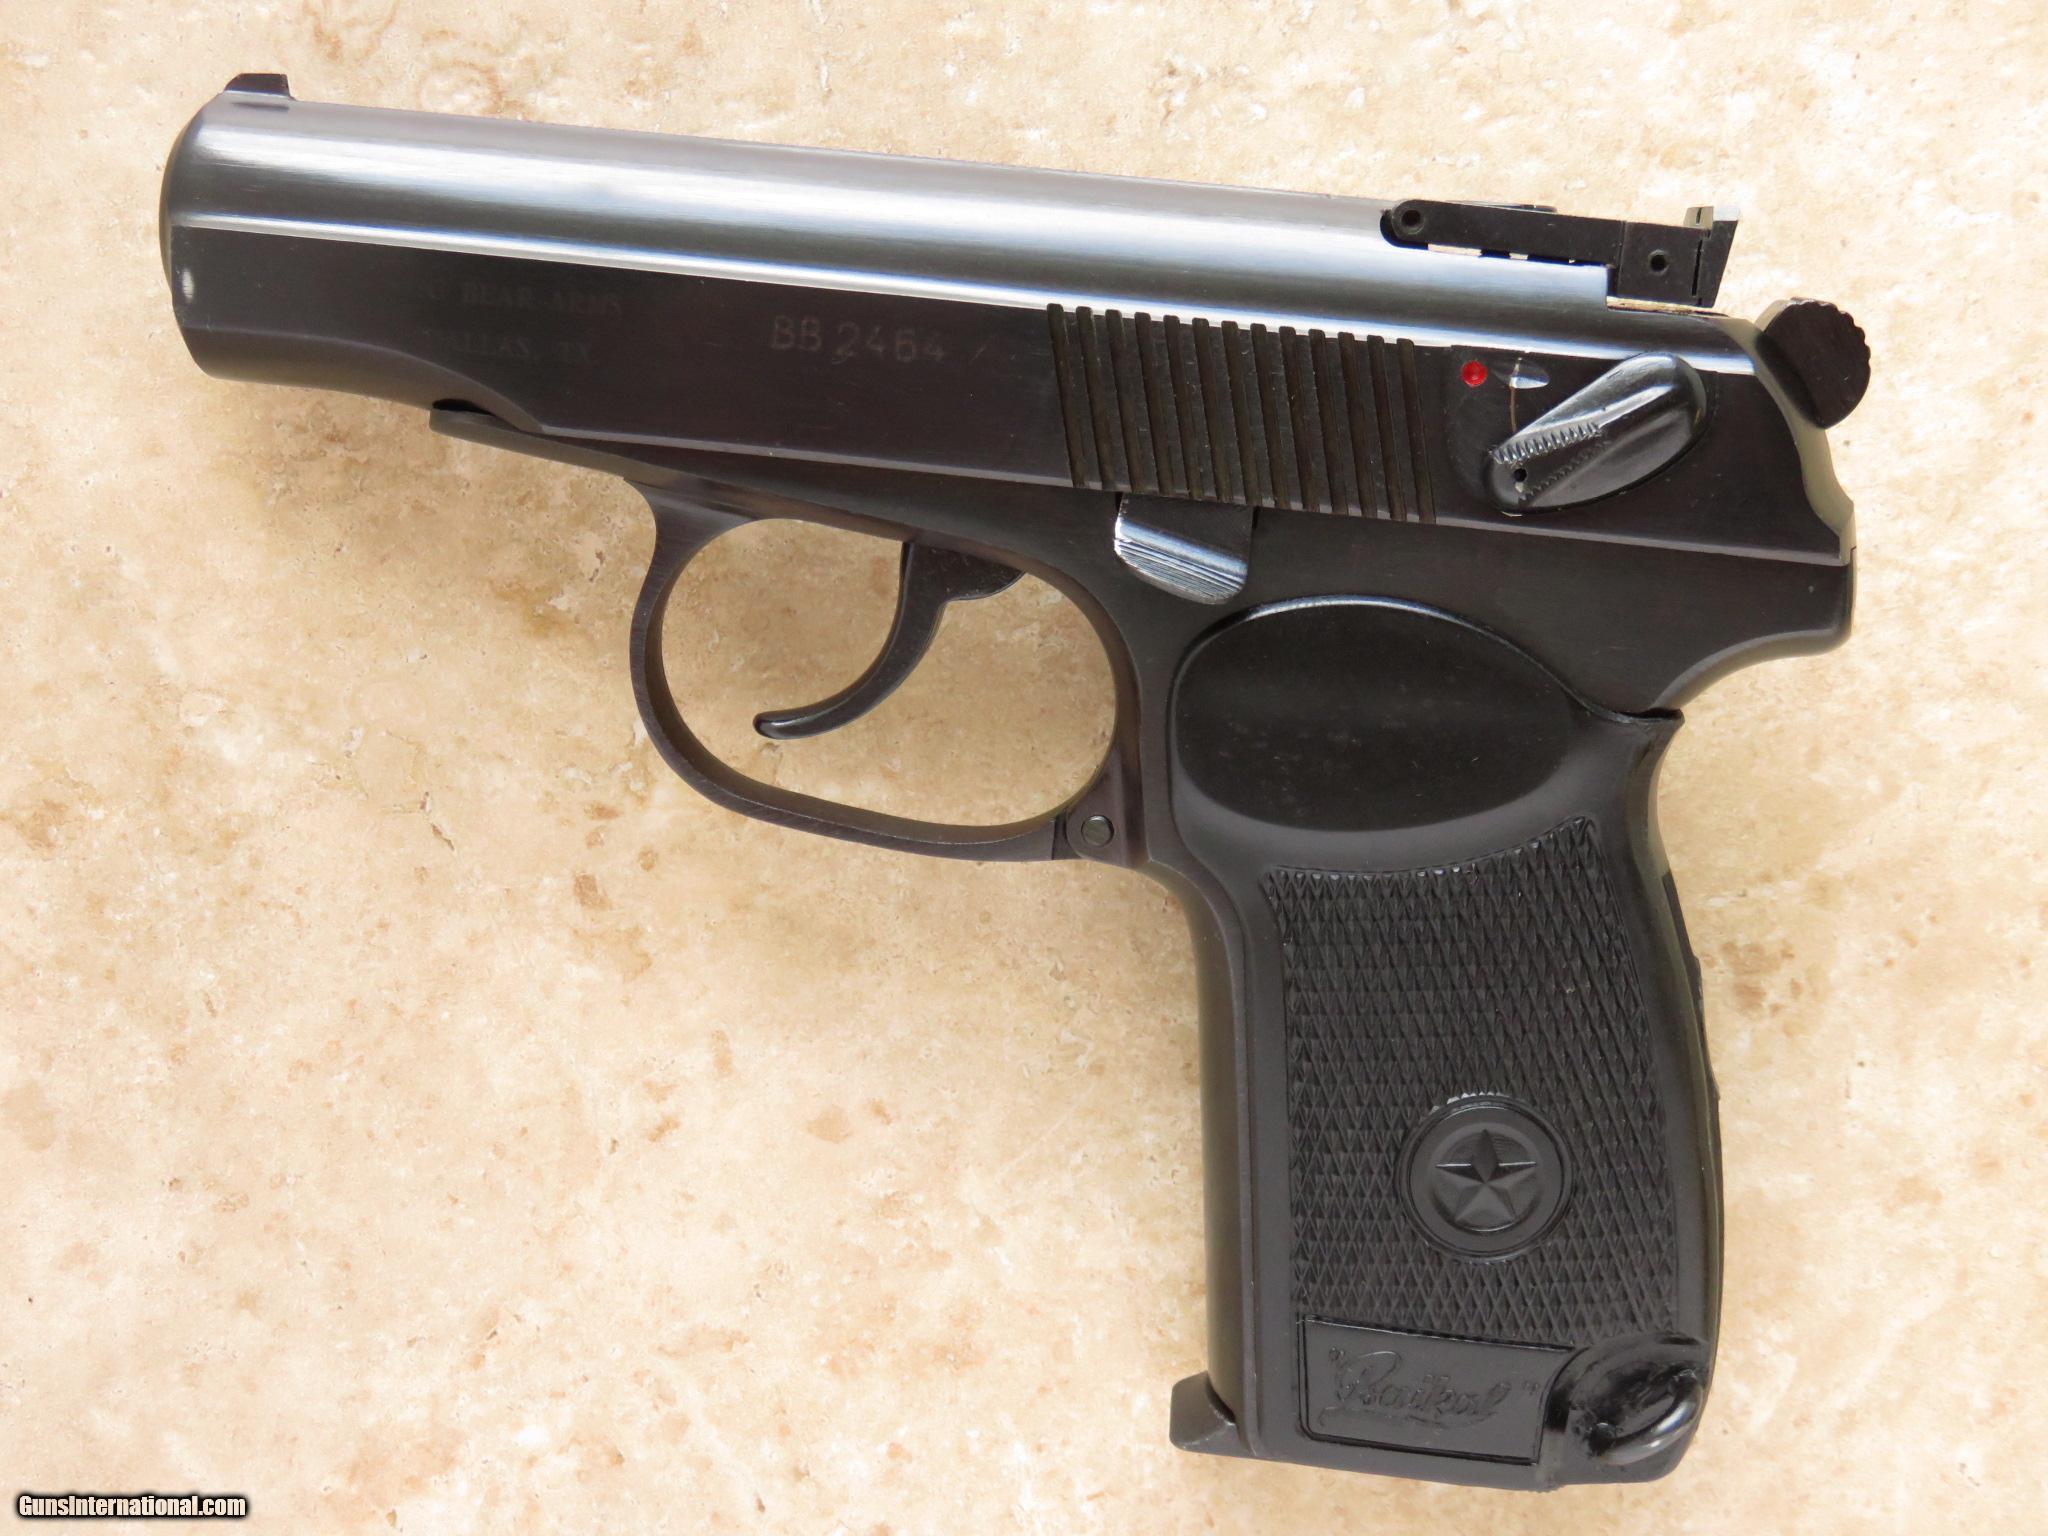 Russian Makarov Pistol, Cal  9x18 Makarov, Baikal IJ-70 SOLD